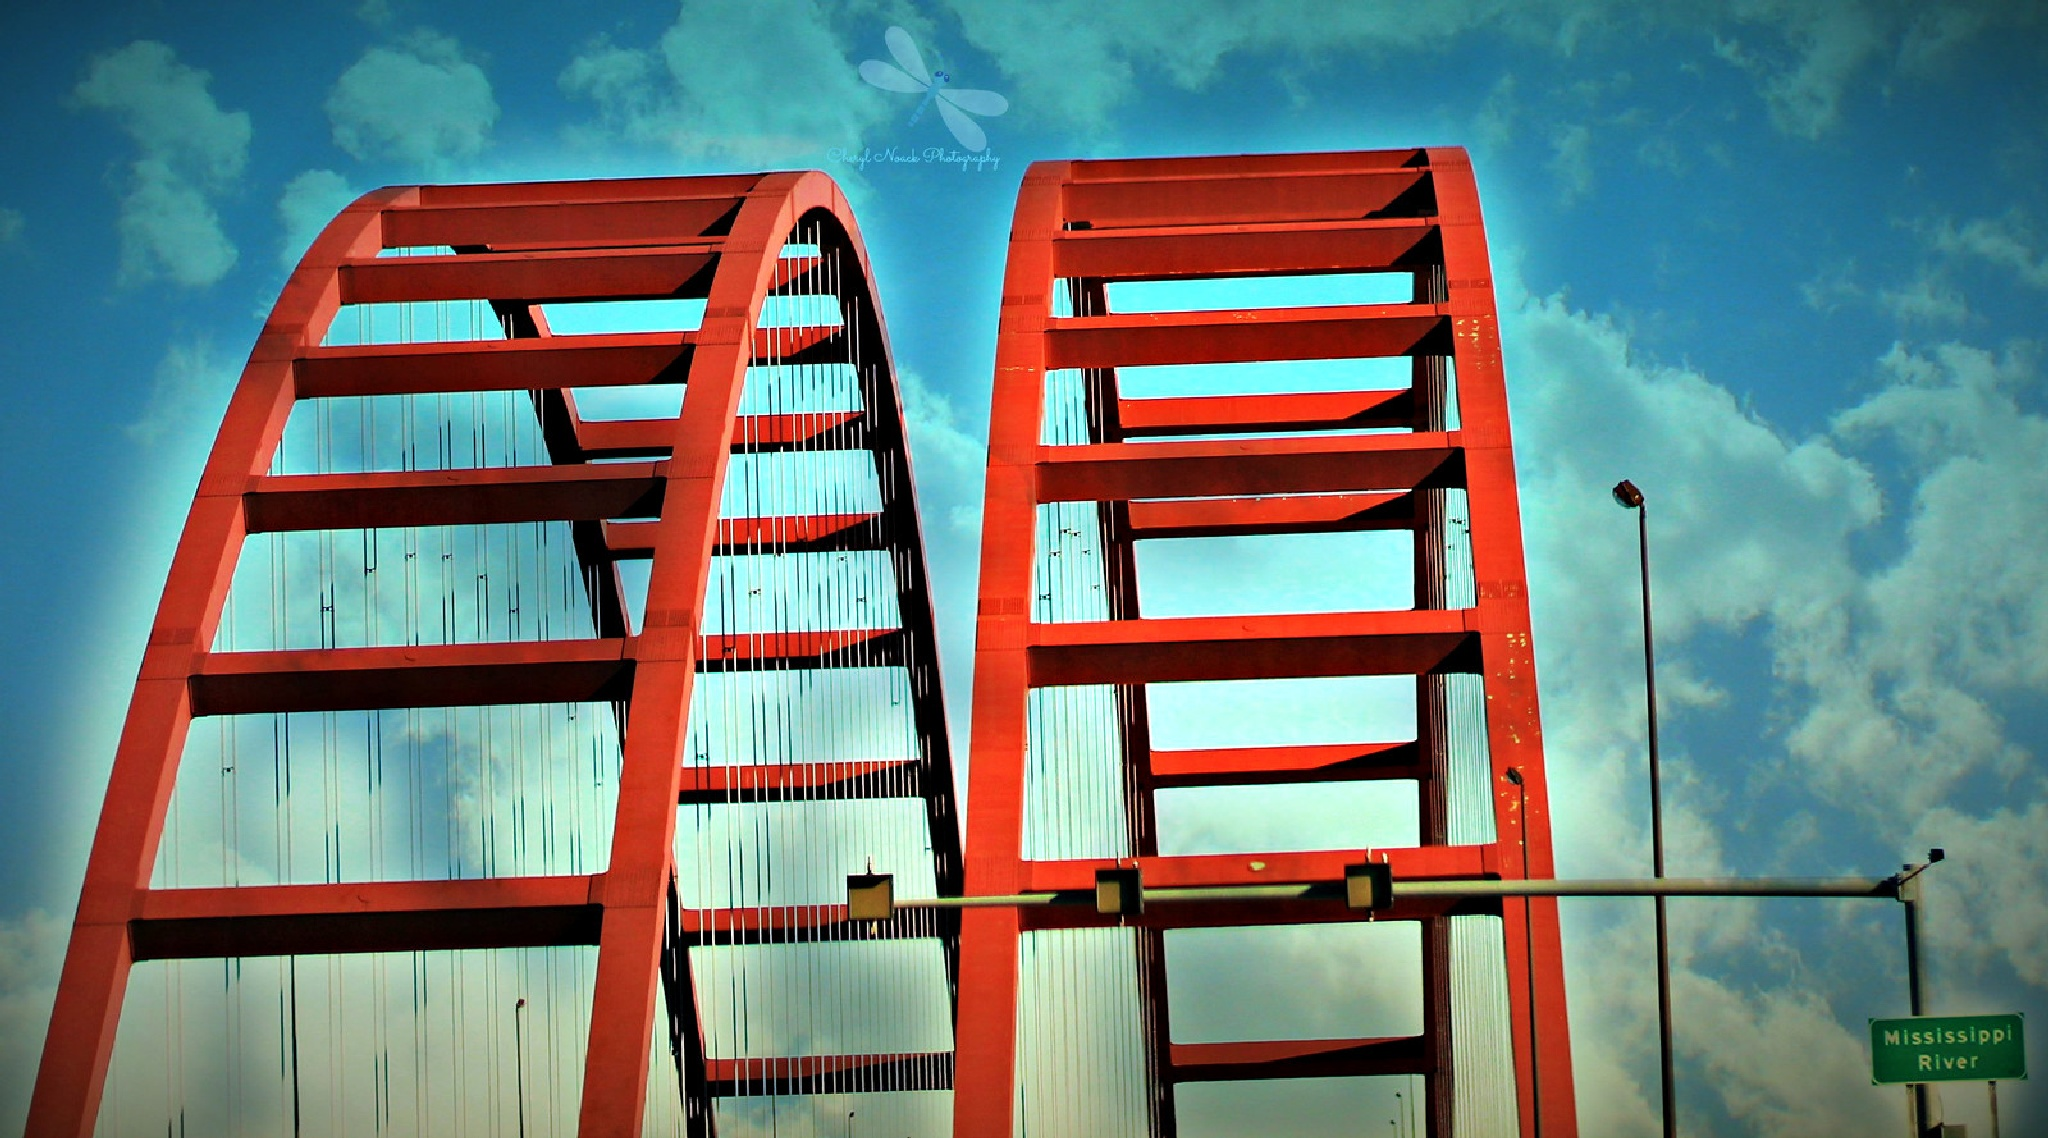 Jefferson Barracks Bridge  by Cheryl Noack Photography